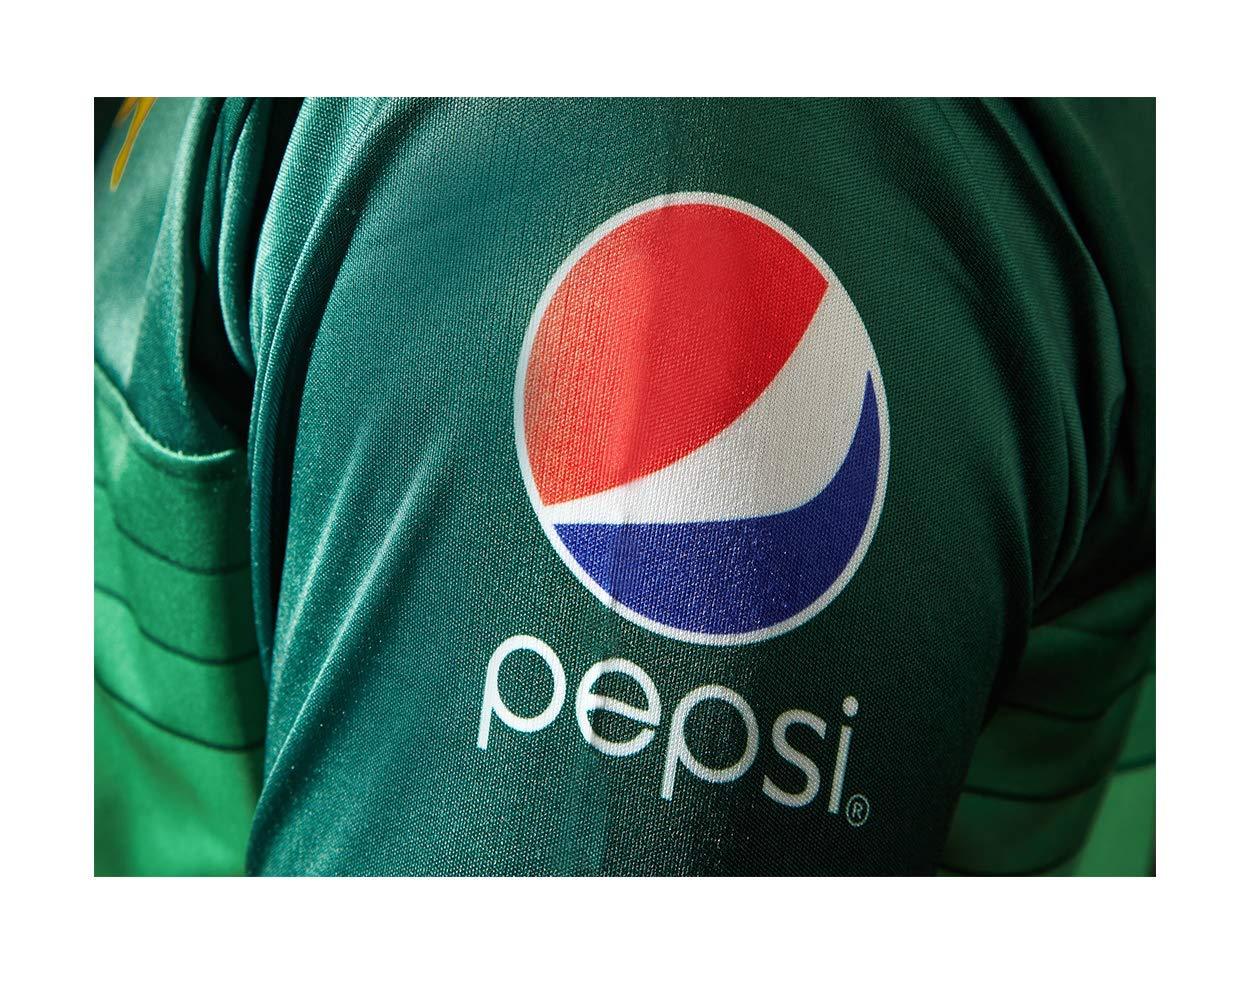 CA-SPORTS Pakistan World Cup ICC T shirt 2019 jersey AJ Sports ICC Original manufacturered